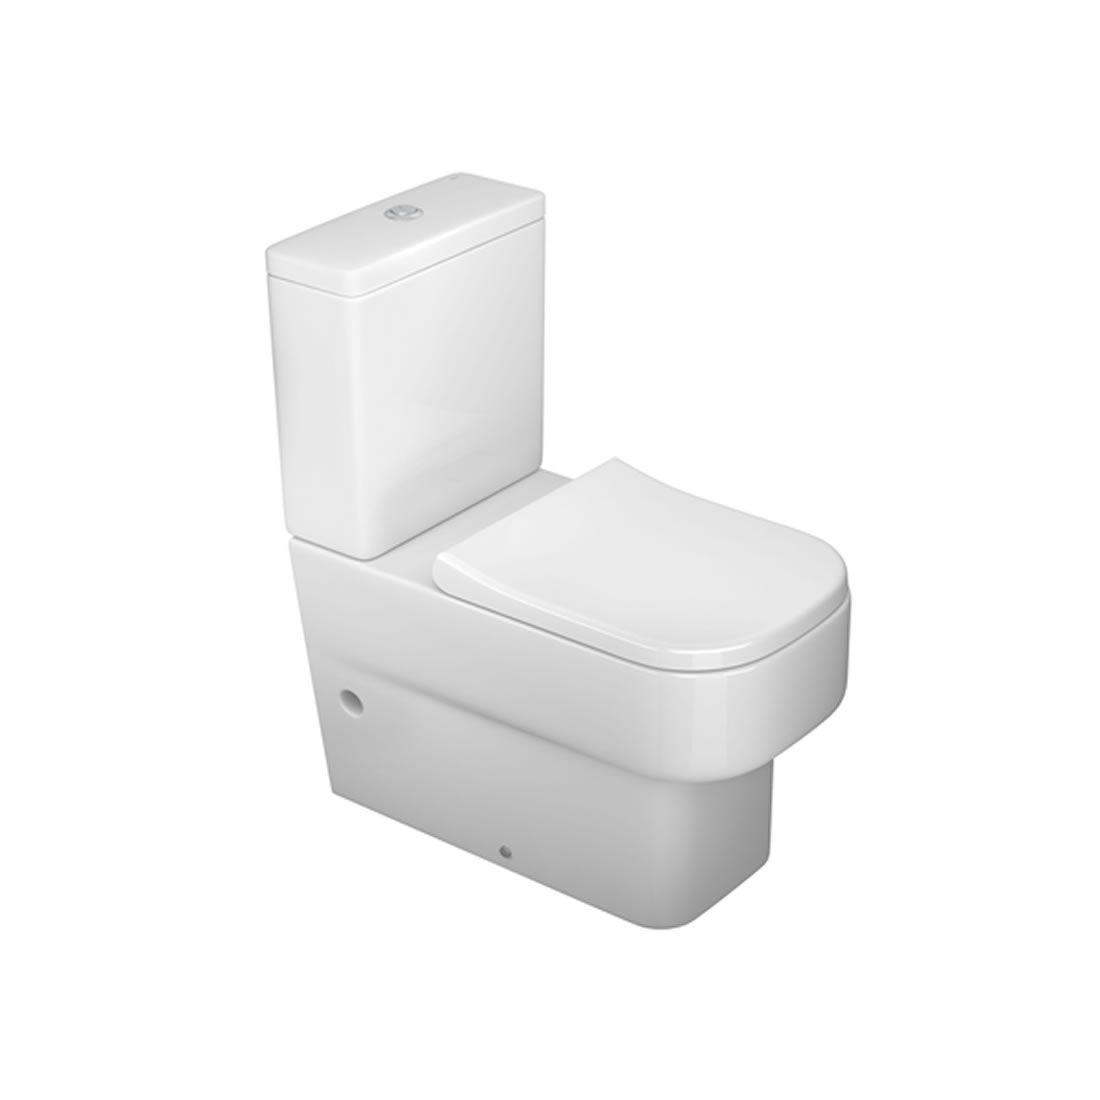 Kit Vaso Sanitário com Caixa Acoplada 3/6L Ecoflush Unic Branco Deca